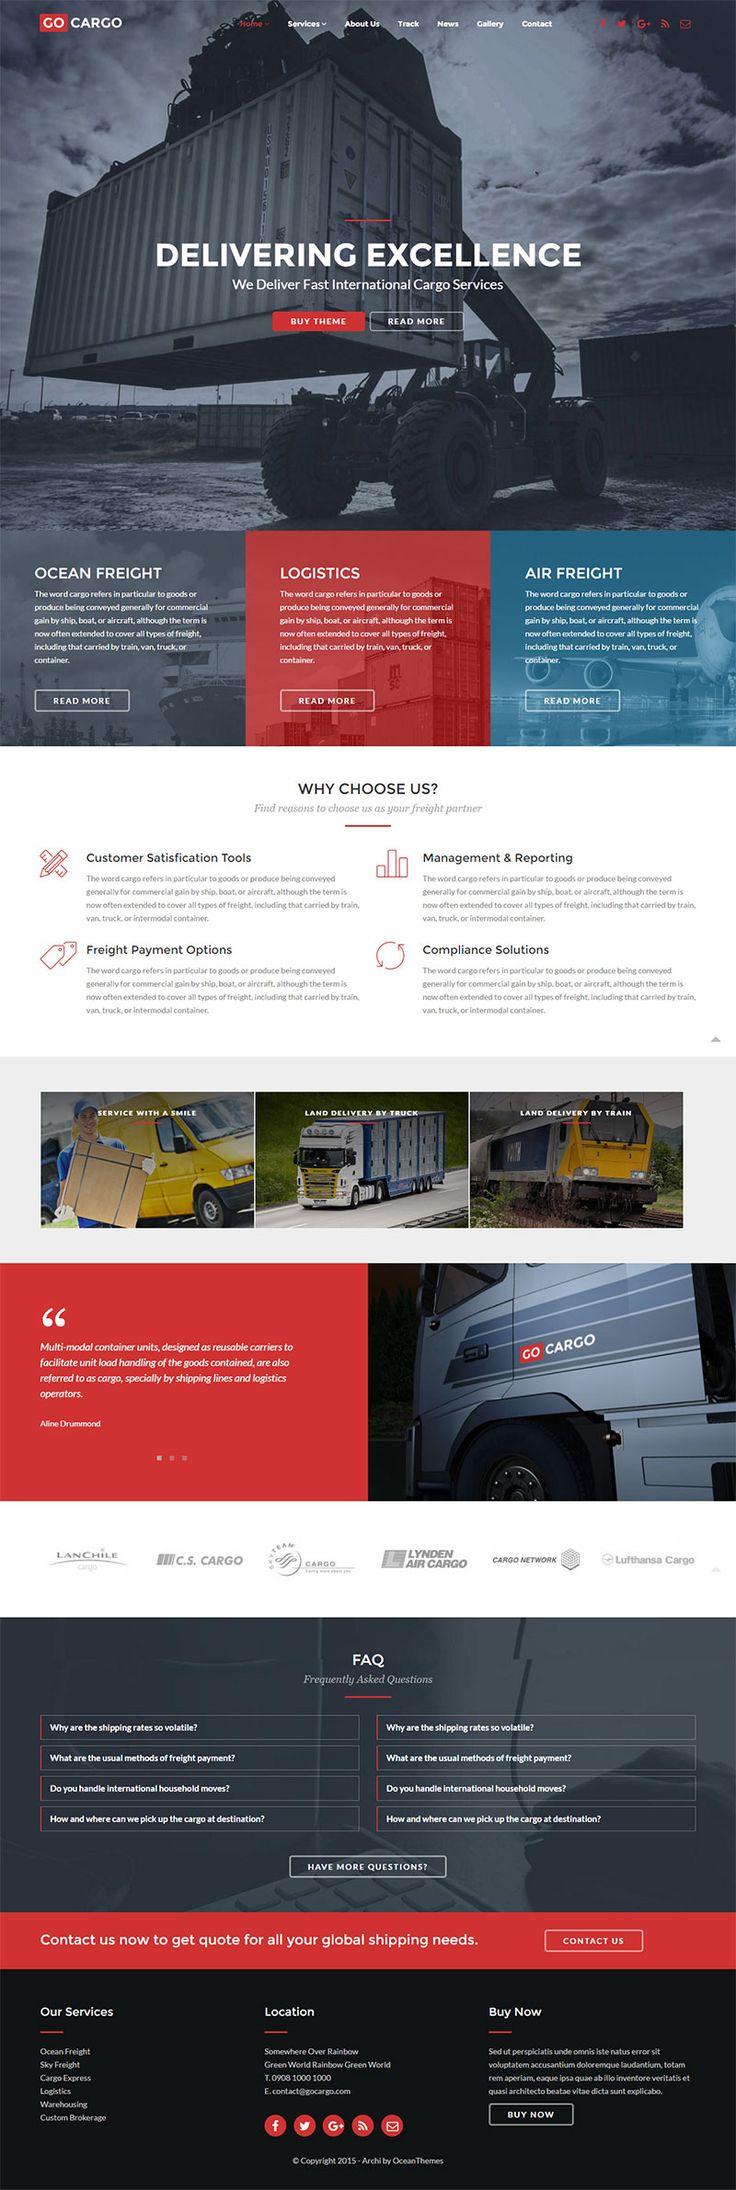 Freight, Logistics & Transportation WordPress Theme. Download : themeforest.net/item/gocargo-freight-logistics-transportation-wordpress-theme/15292056?s_rank=3&ref=pxcr